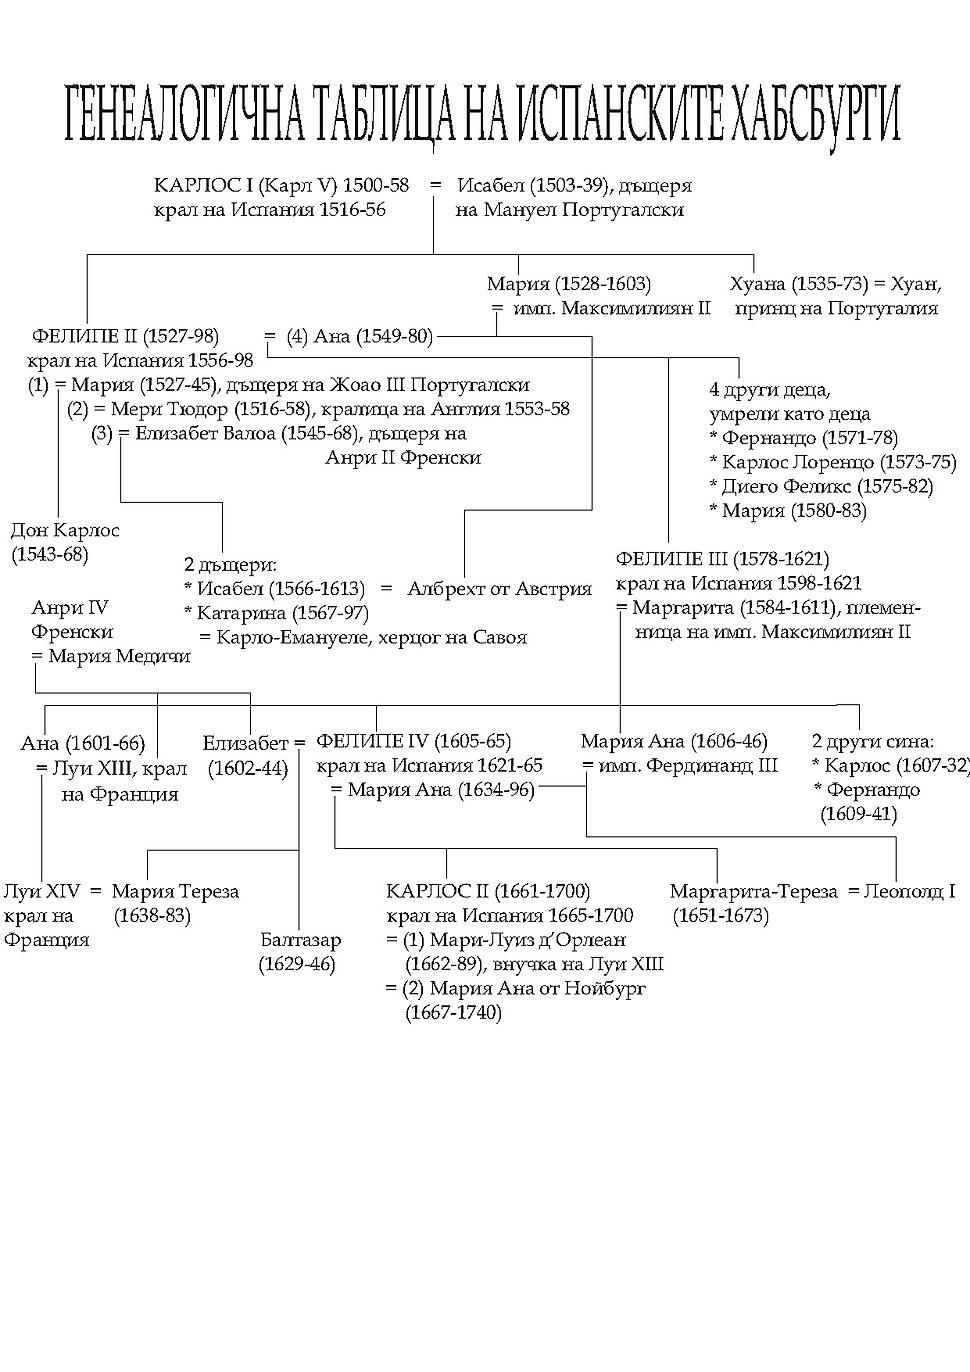 Spanish Habsburgs